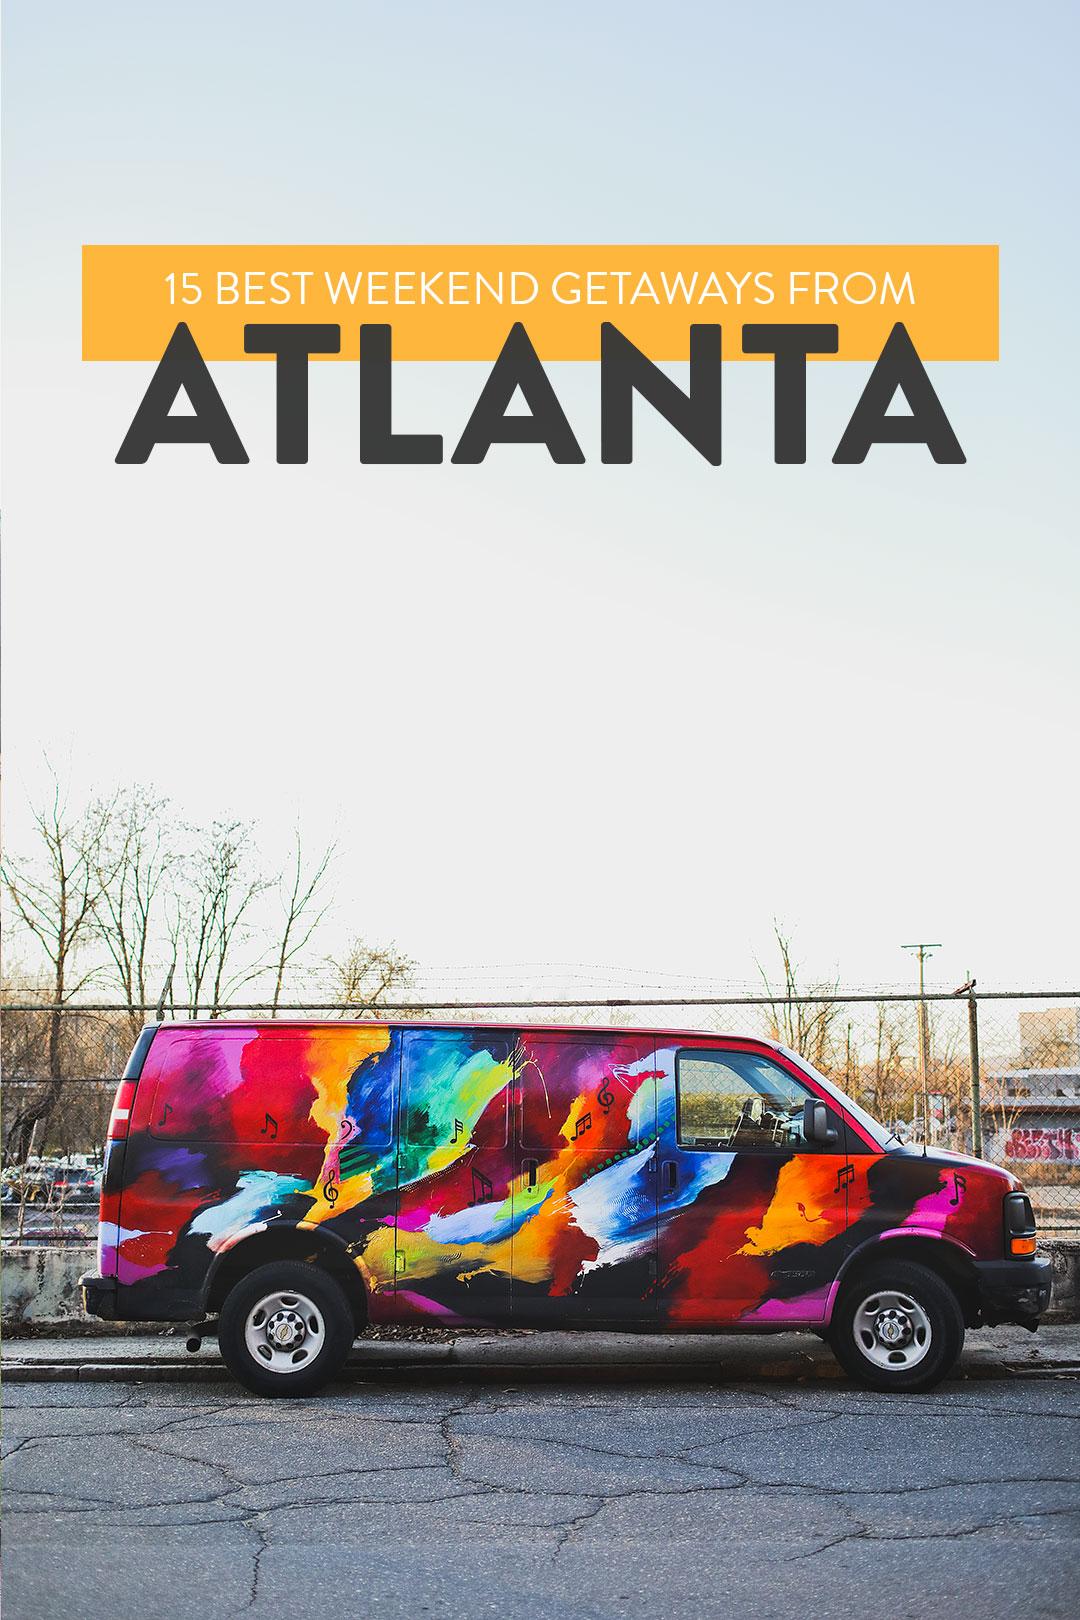 15 Best Weekend Trips From Atlanta Georgia A Guide To Great Getaways